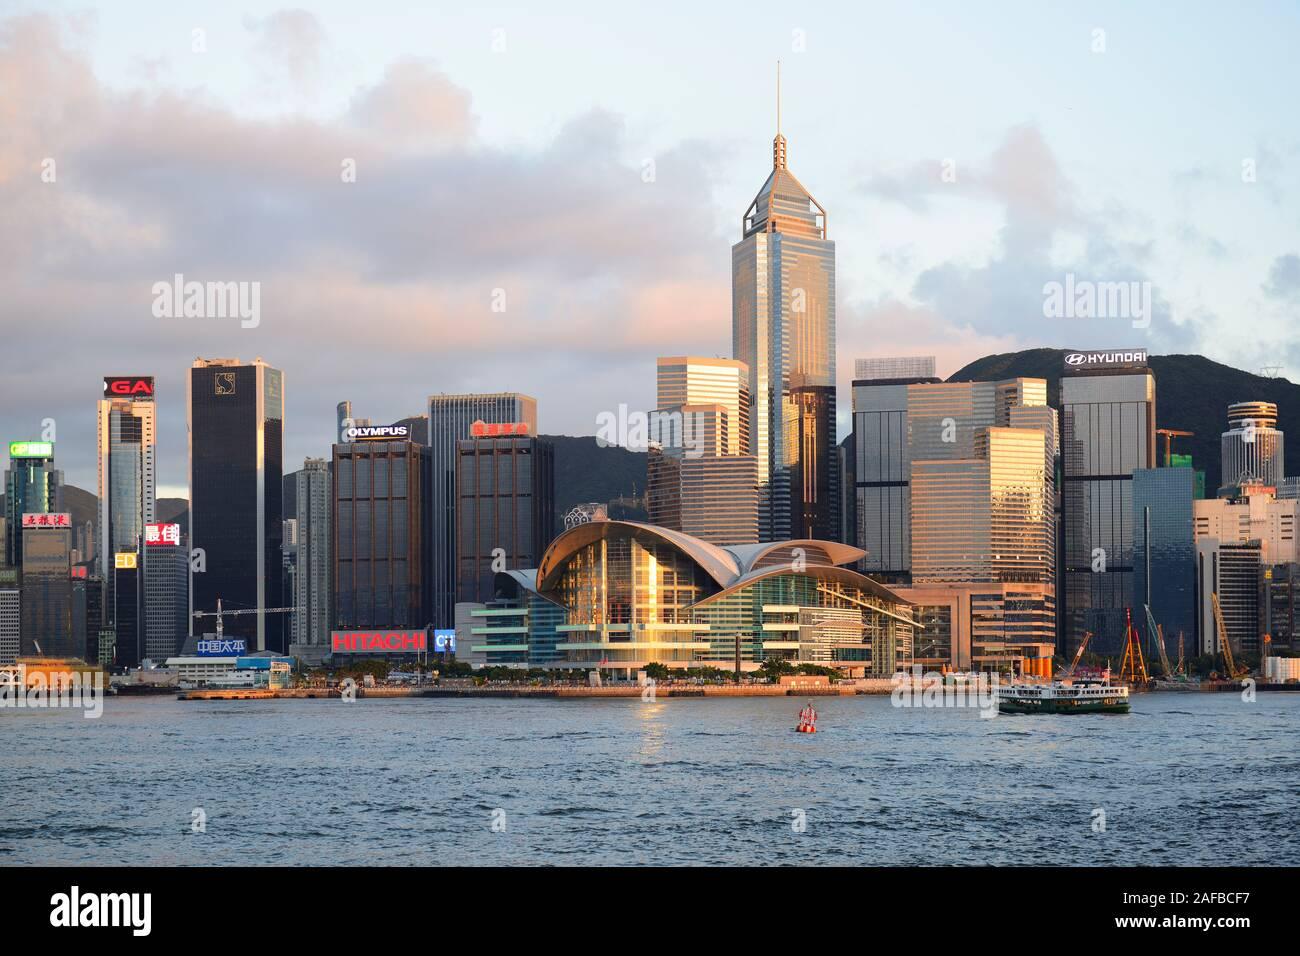 Blick von Kowloon bei Sonnenuntergang auf die Skyline auf Hongkong Island am Hongkong River, Central, mit dem International Conference Center , Hongko Stock Photo